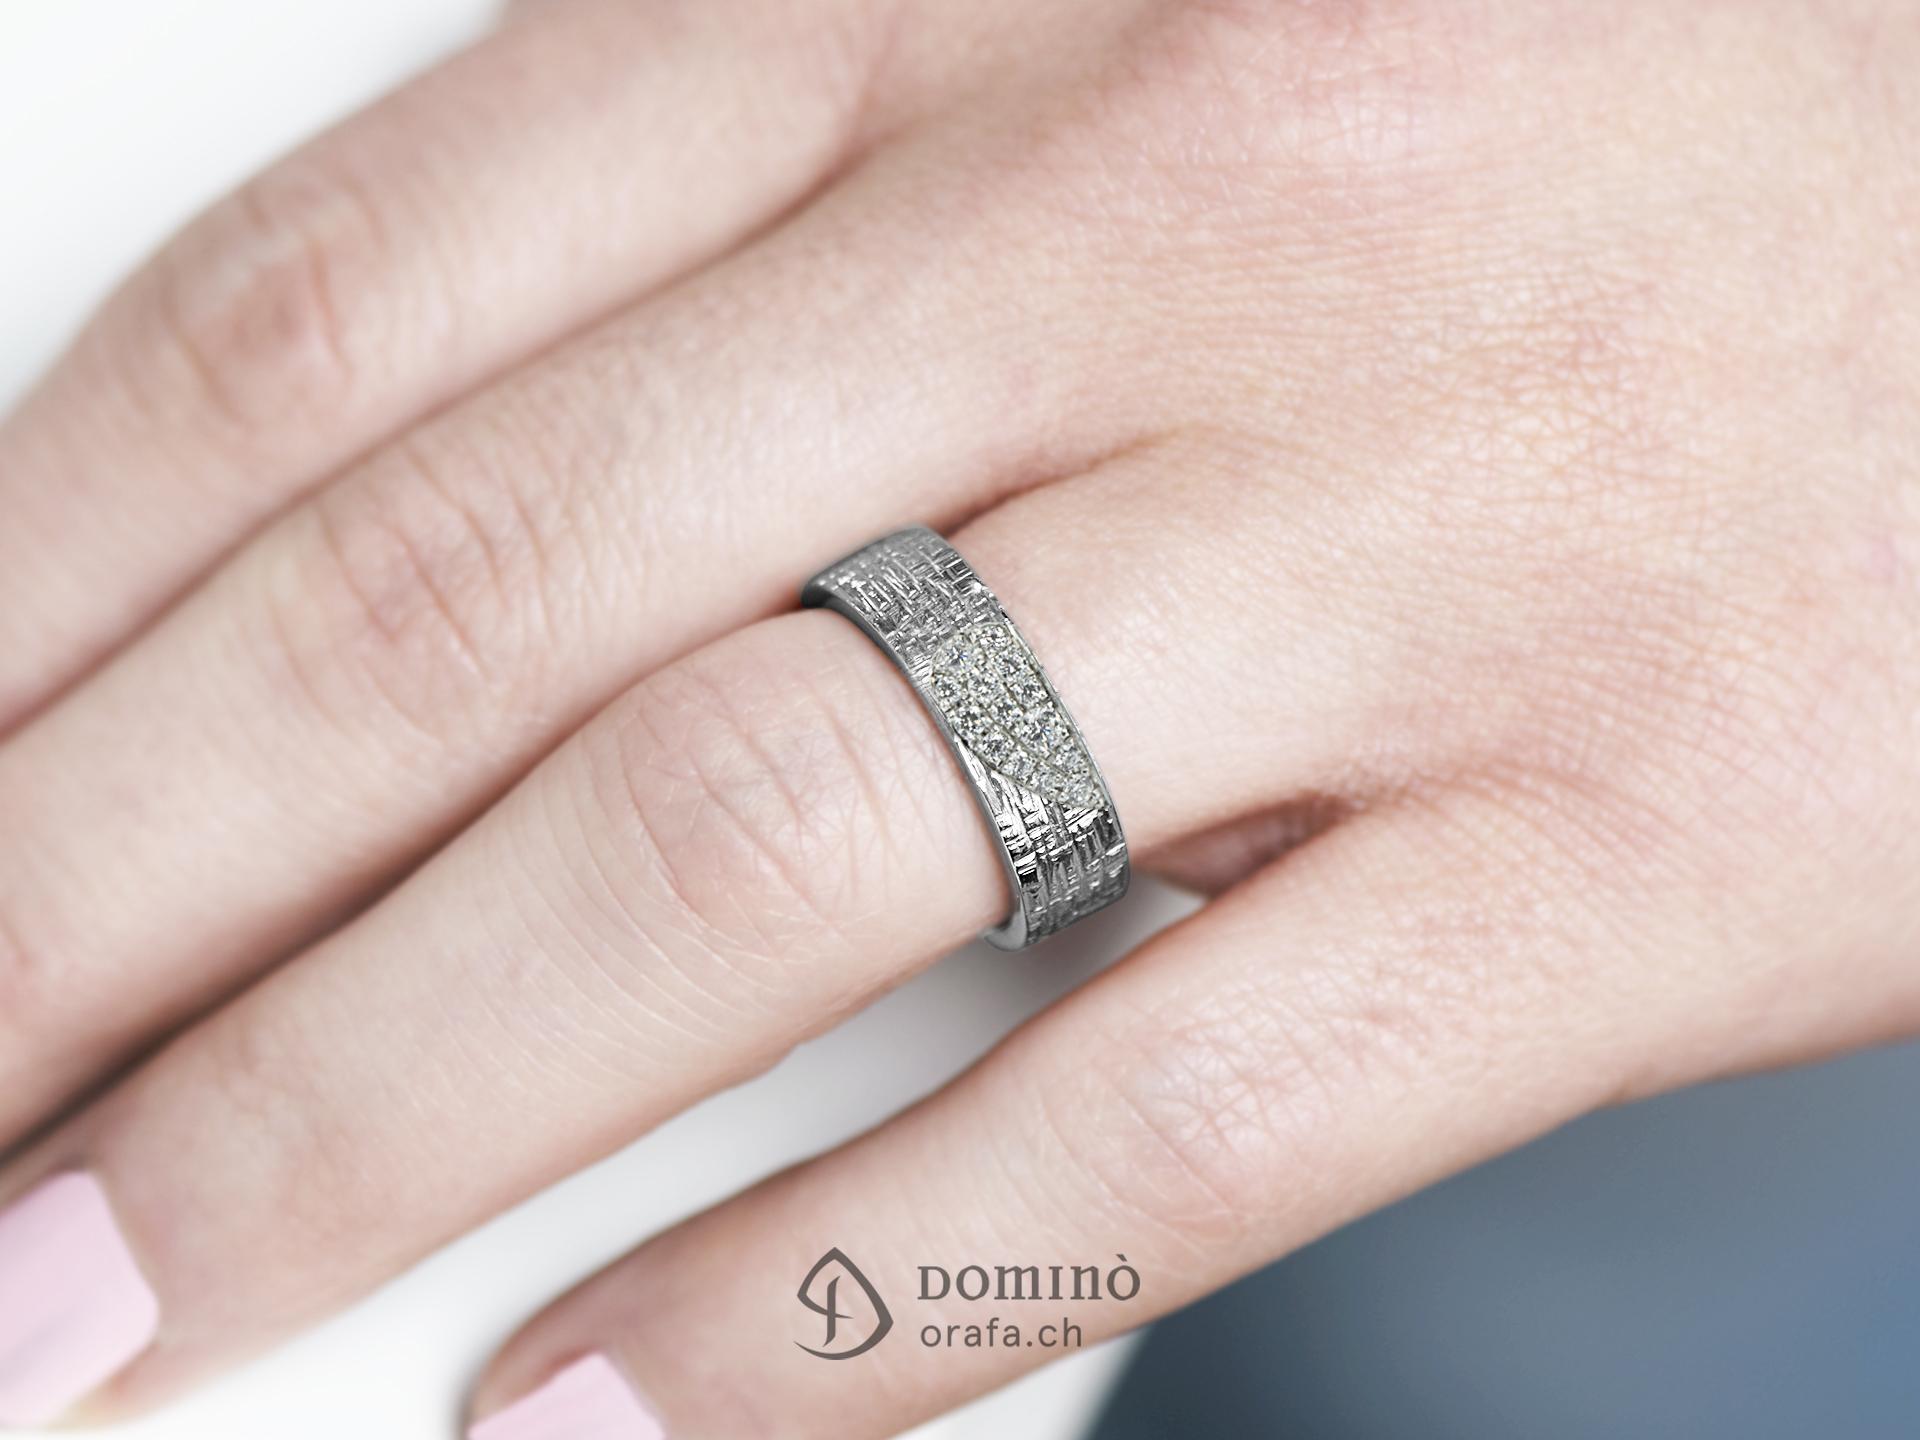 fedi-nuziali-linee-incrociate-cuore-diamanti-inciso-1